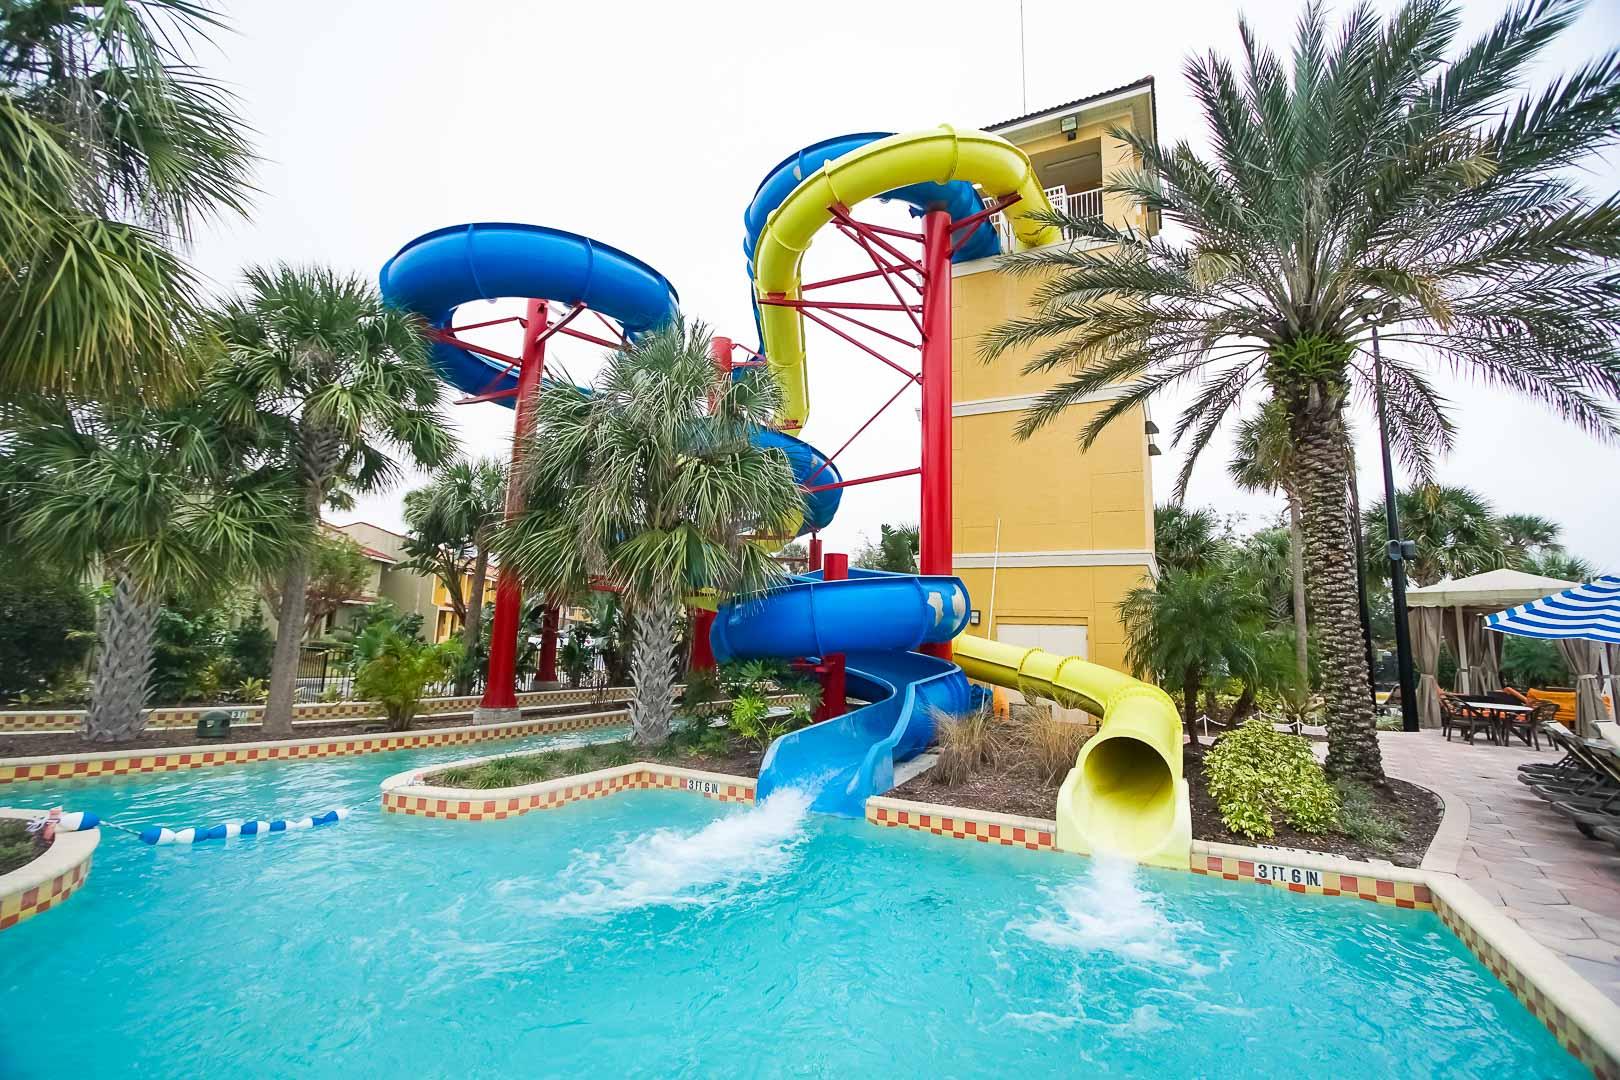 A fun-filled water-slide at VRI's Fantasy World Resort in Florida.